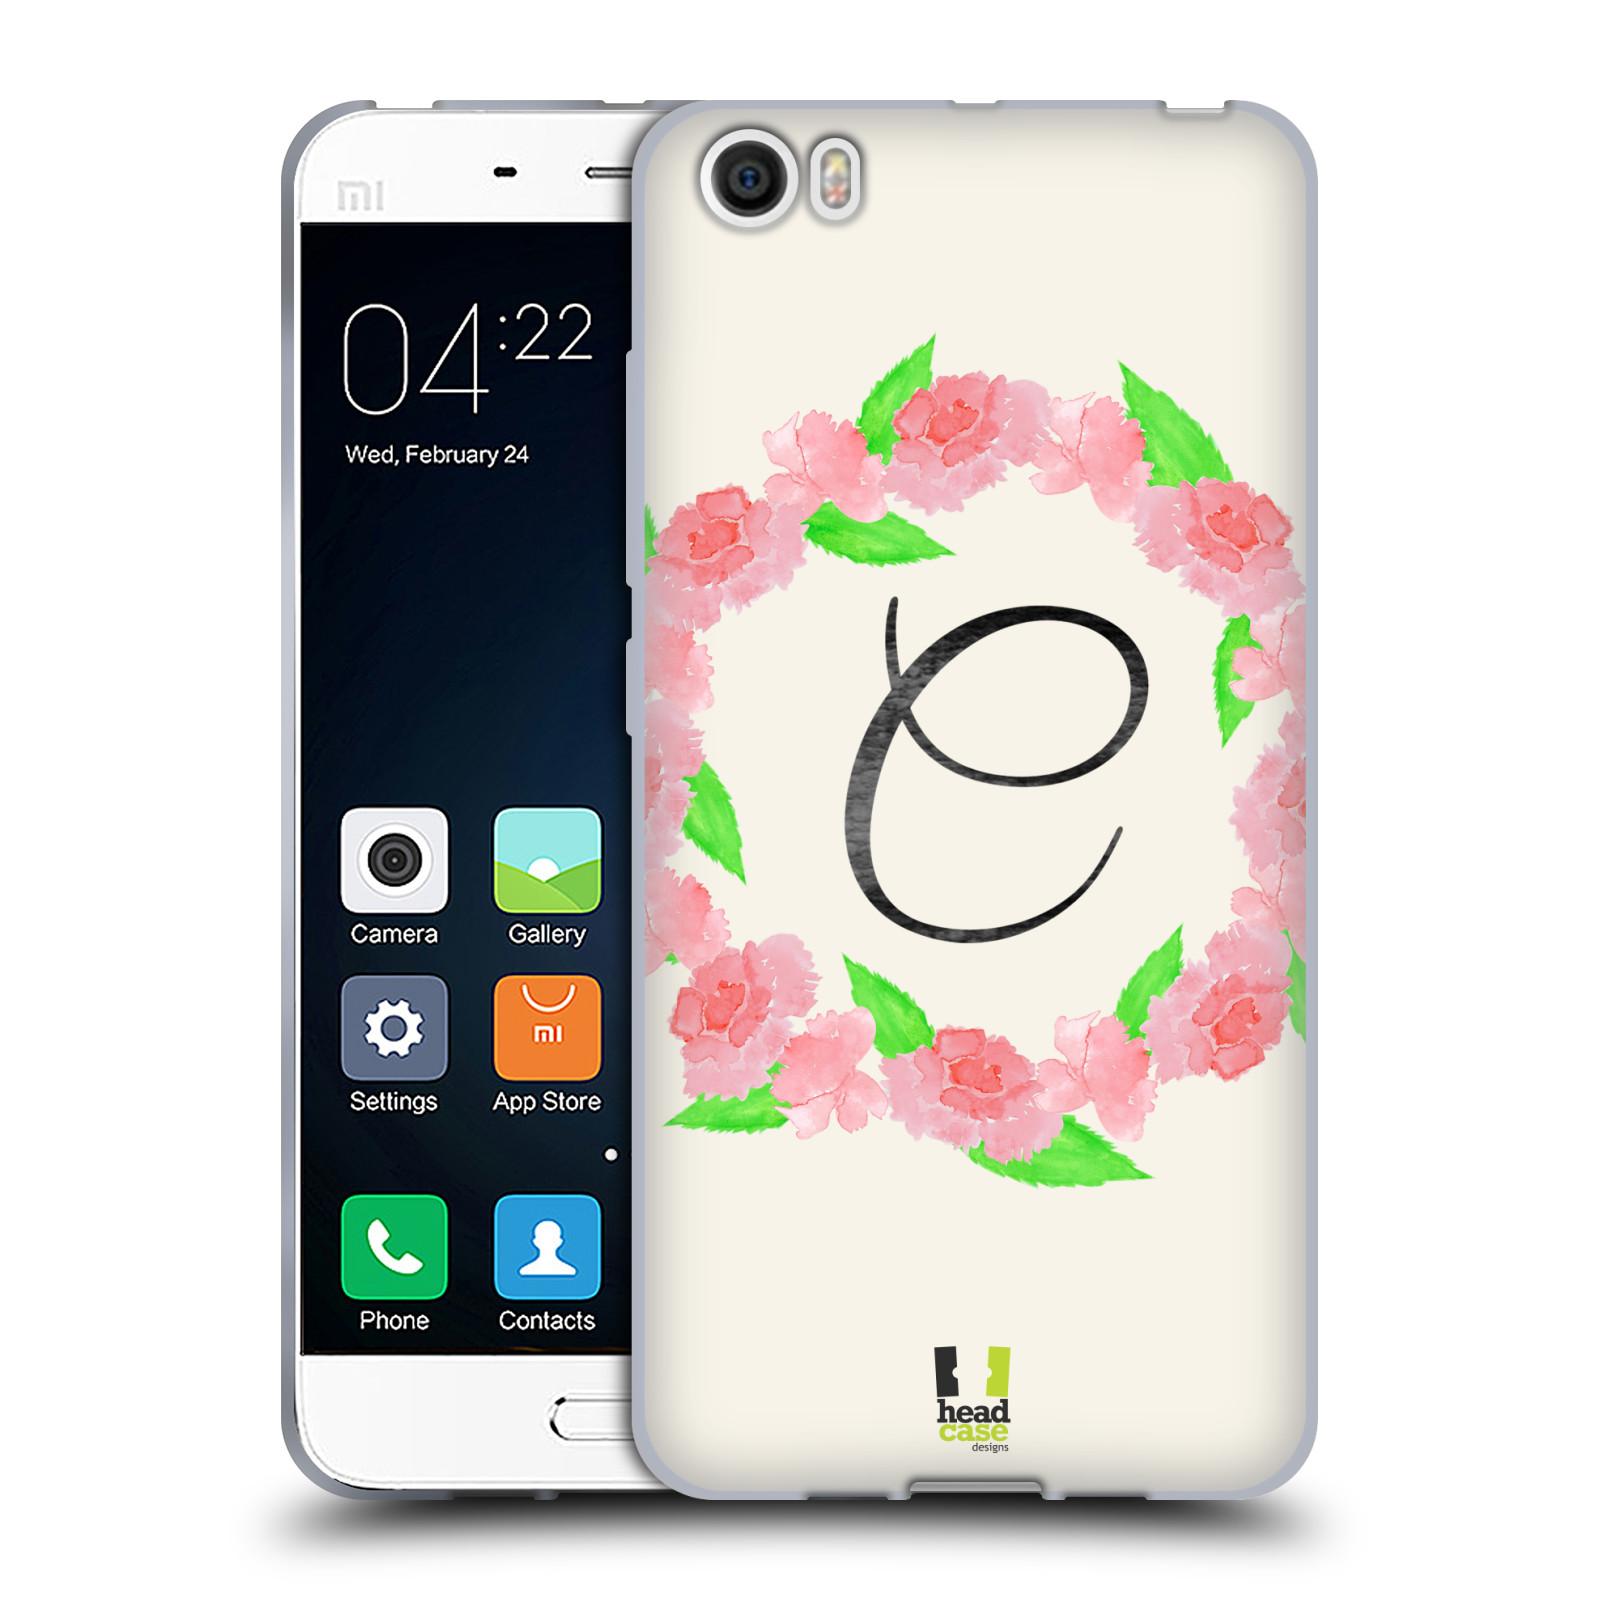 HEAD-CASE-DESIGNS-FLORAL-WREATH-SOFT-GEL-CASE-FOR-XIAOMI-PHONES